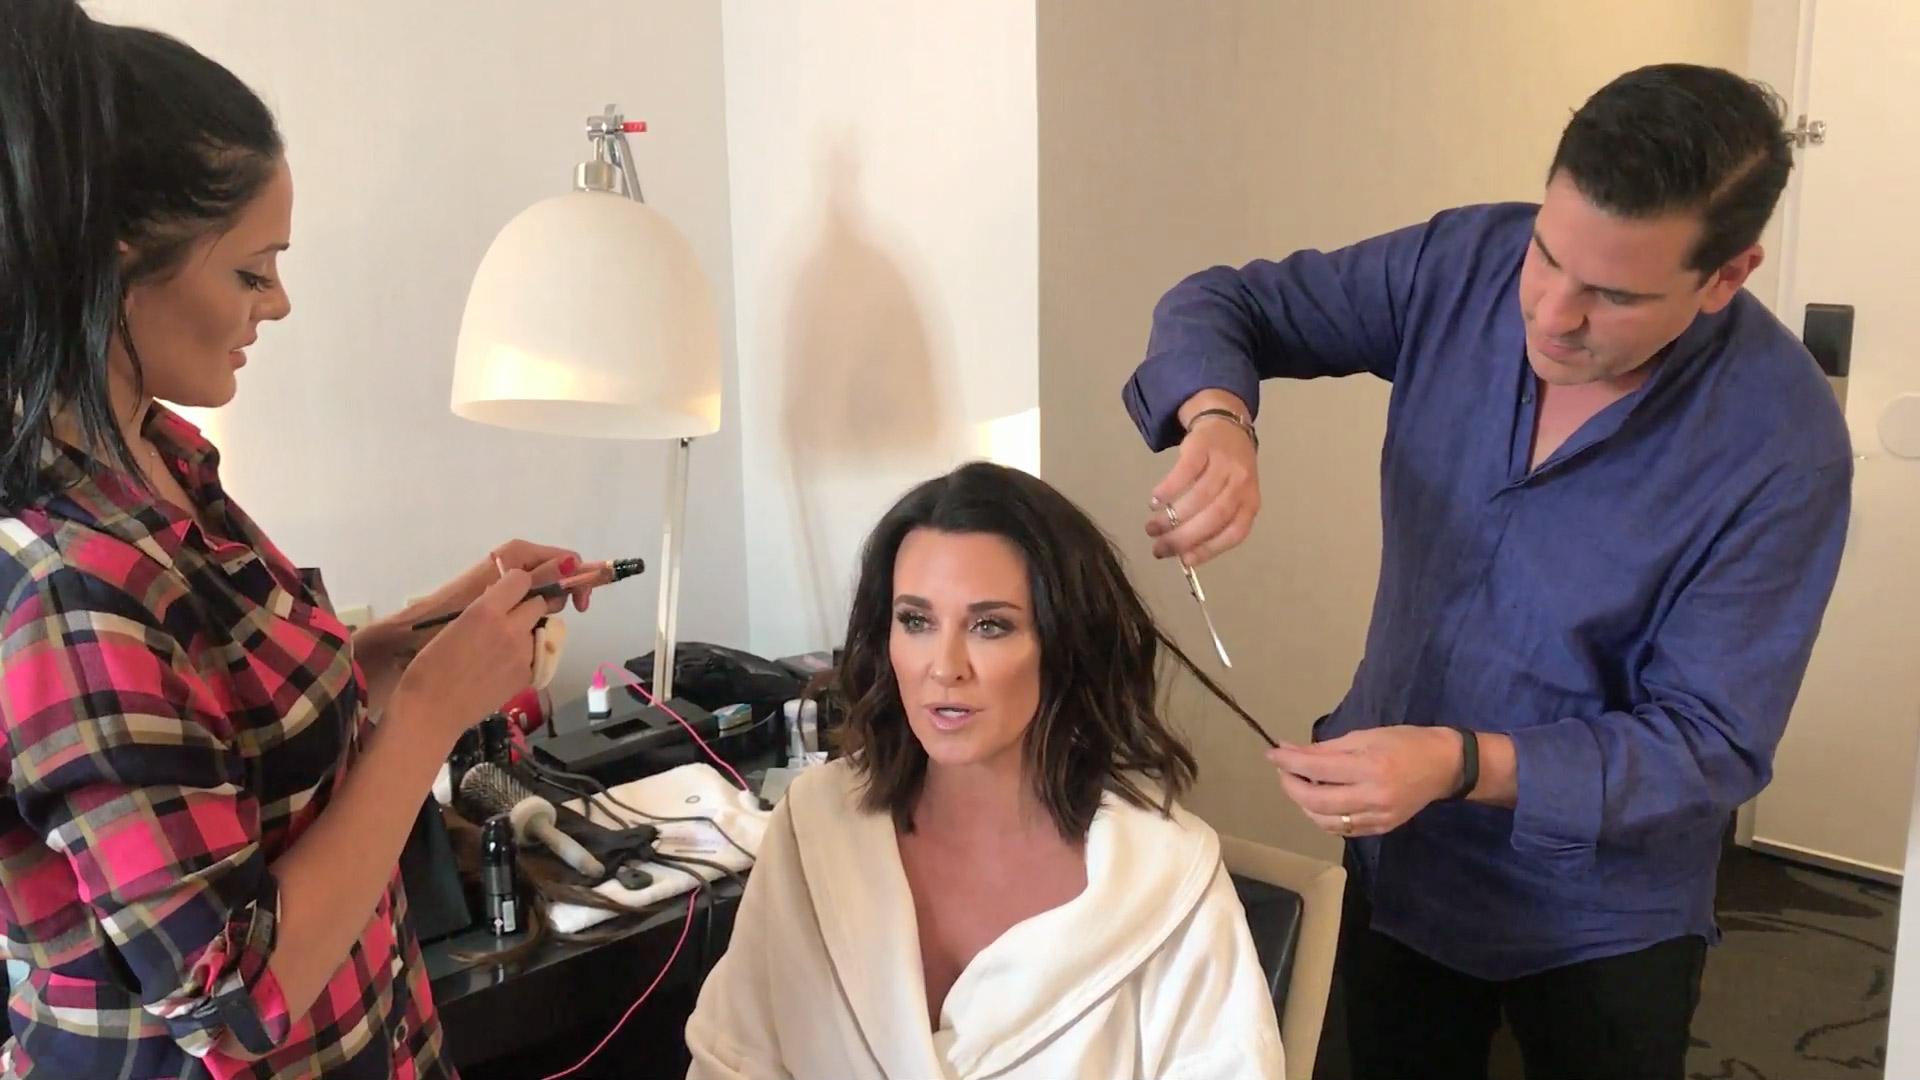 Jenna Dewan Tatum Gets New Short Haircut See Her Blunt Bob Style Living